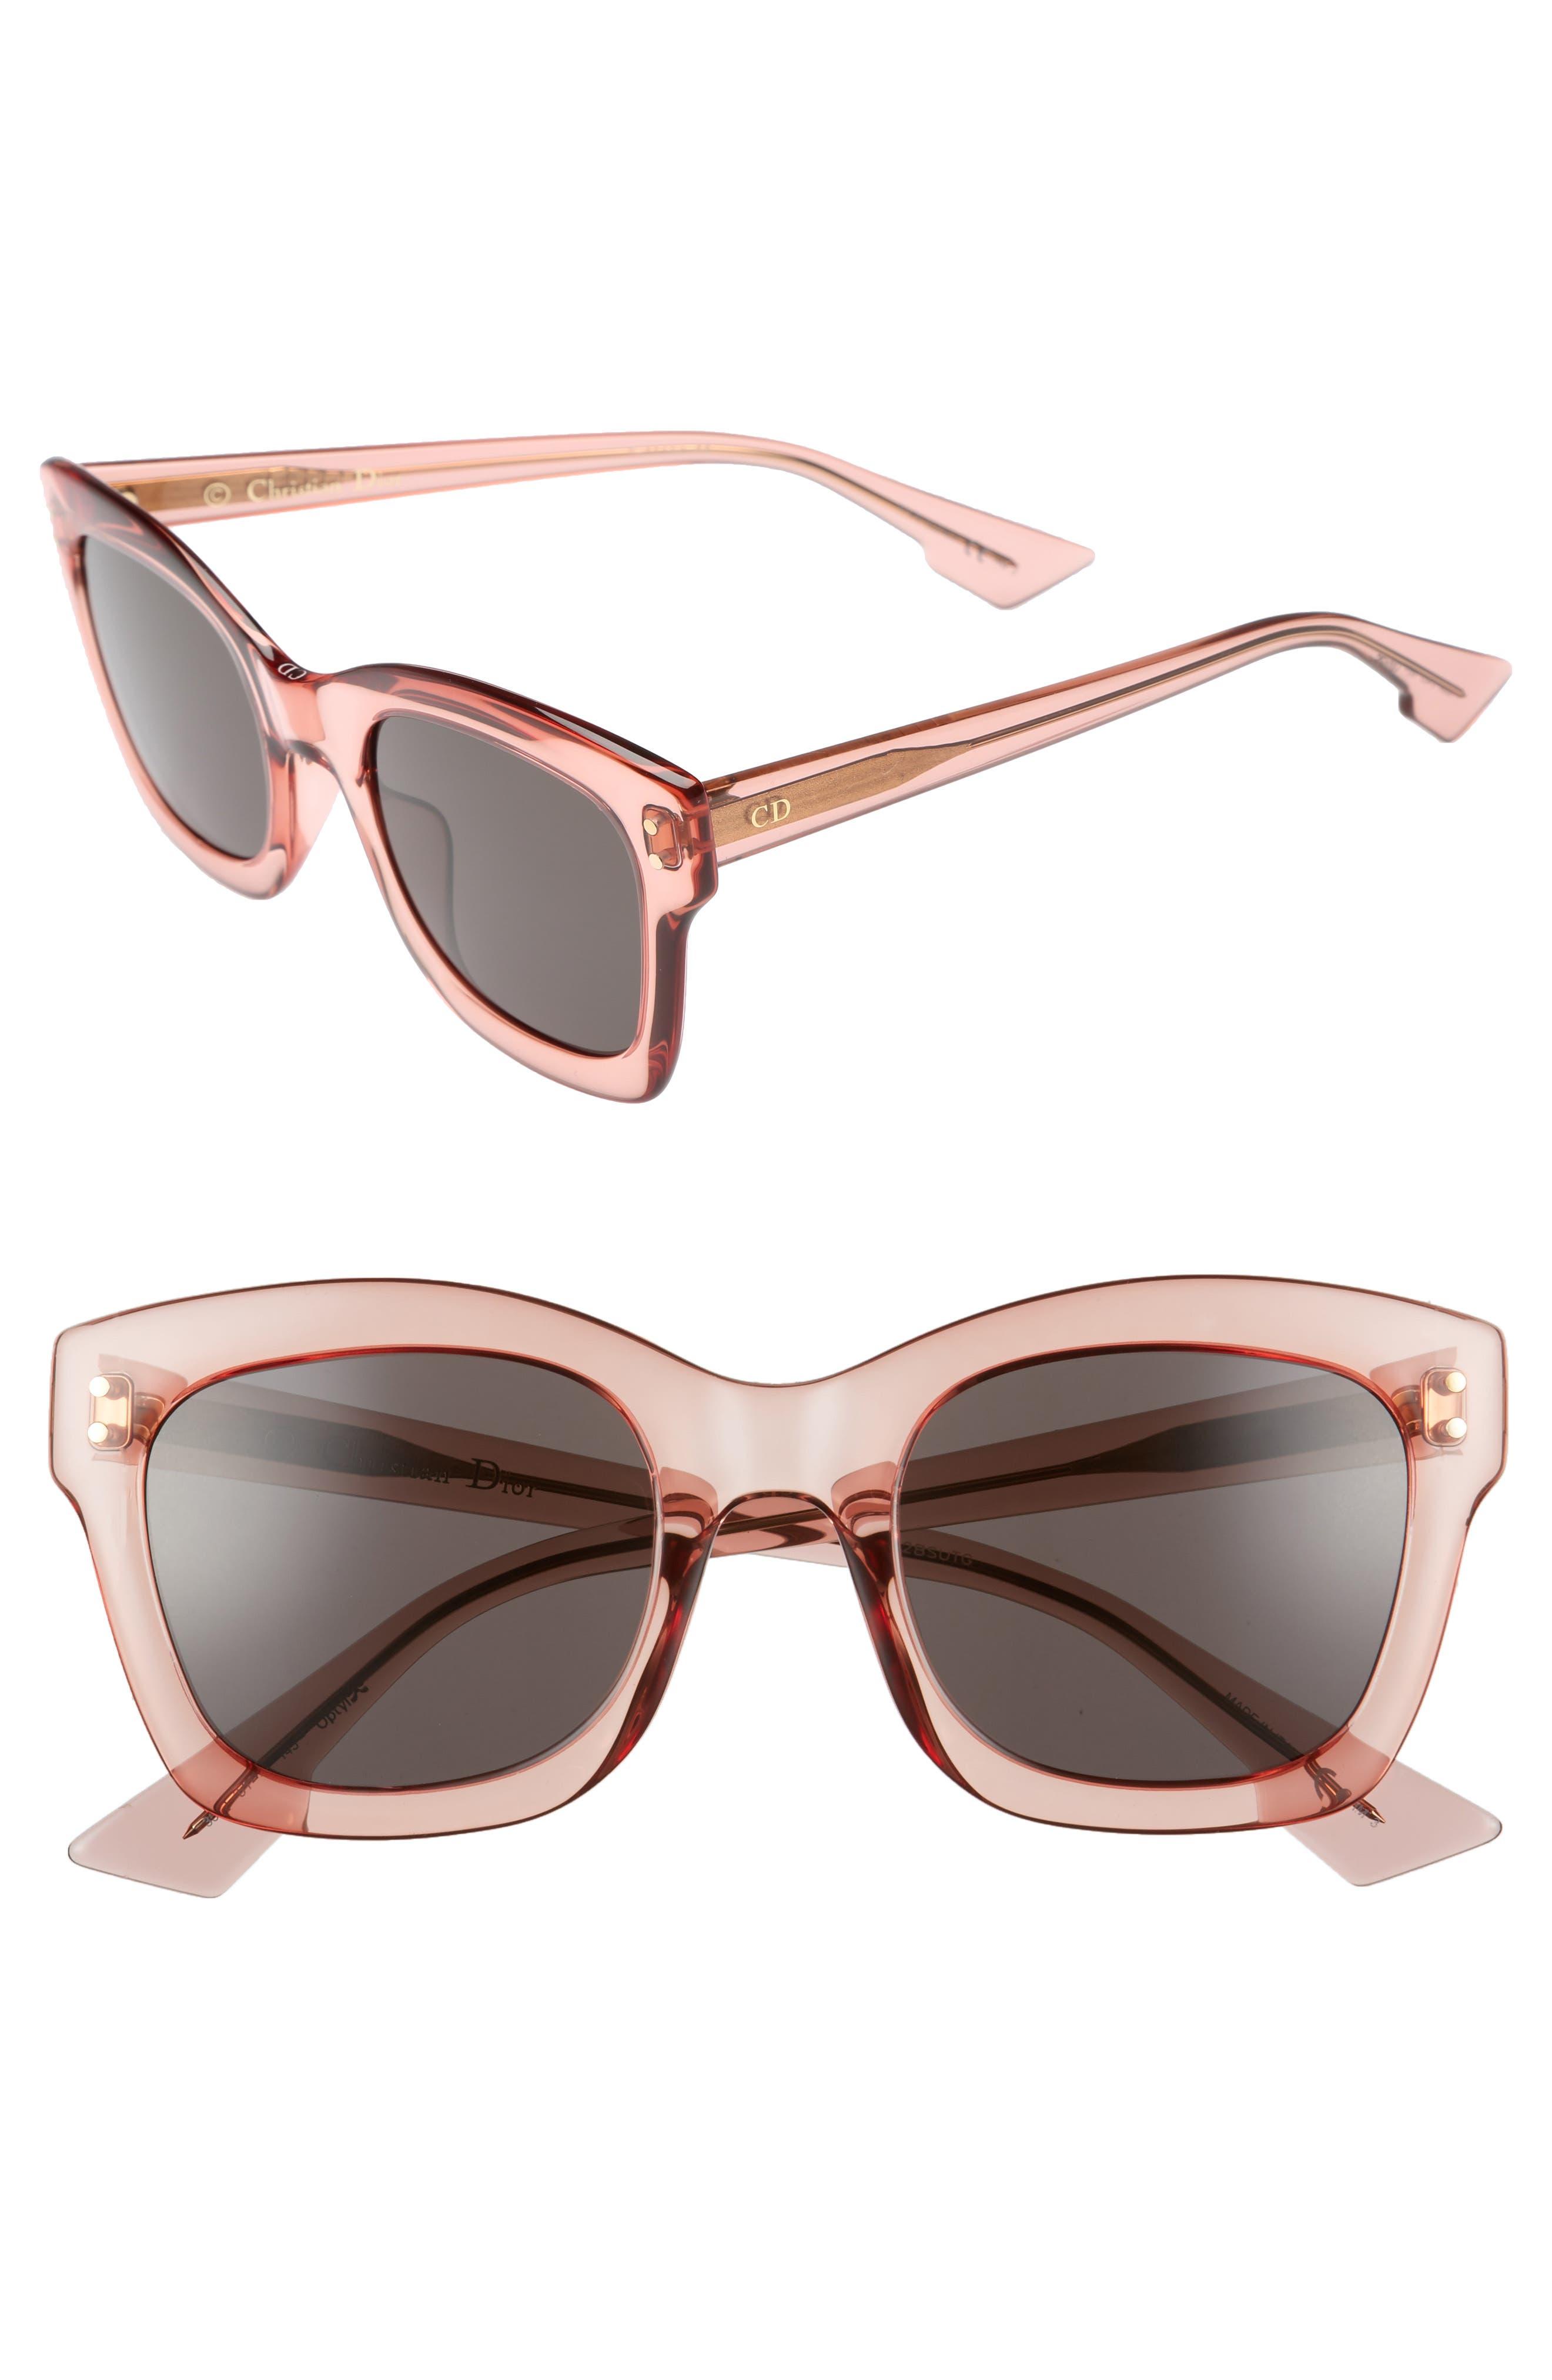 Dior Izon 51mm Sunglasses